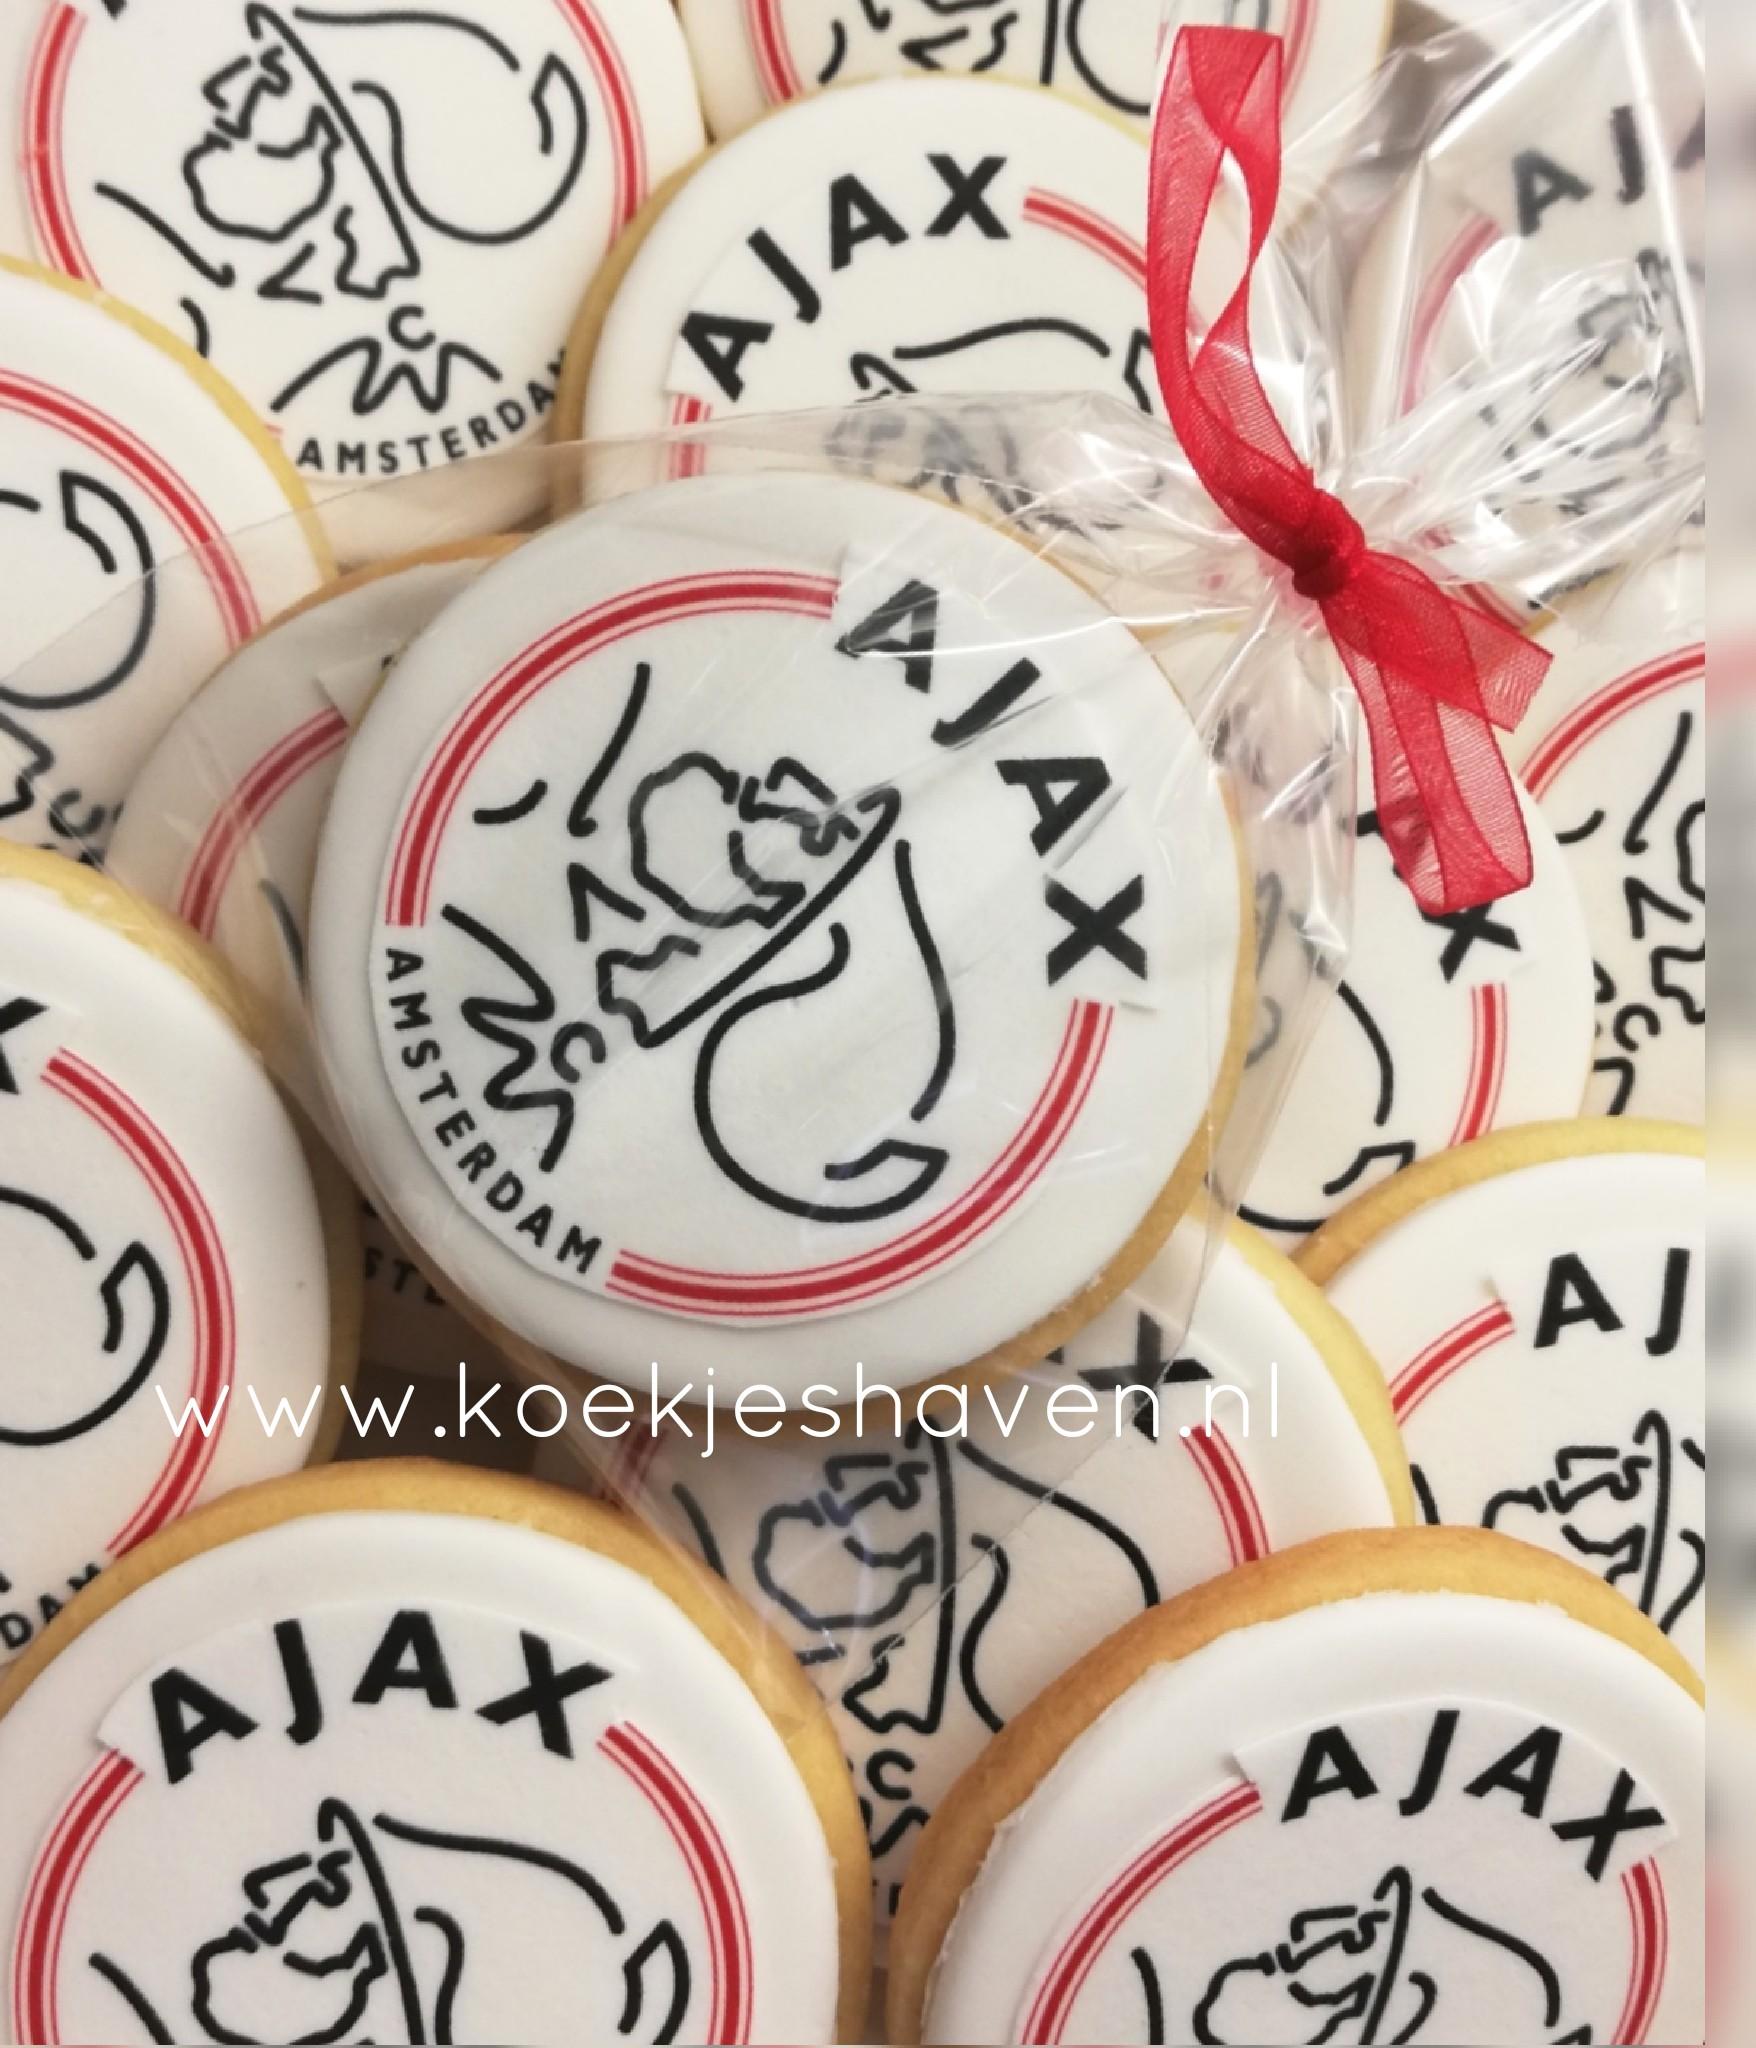 Ajax Koekjes